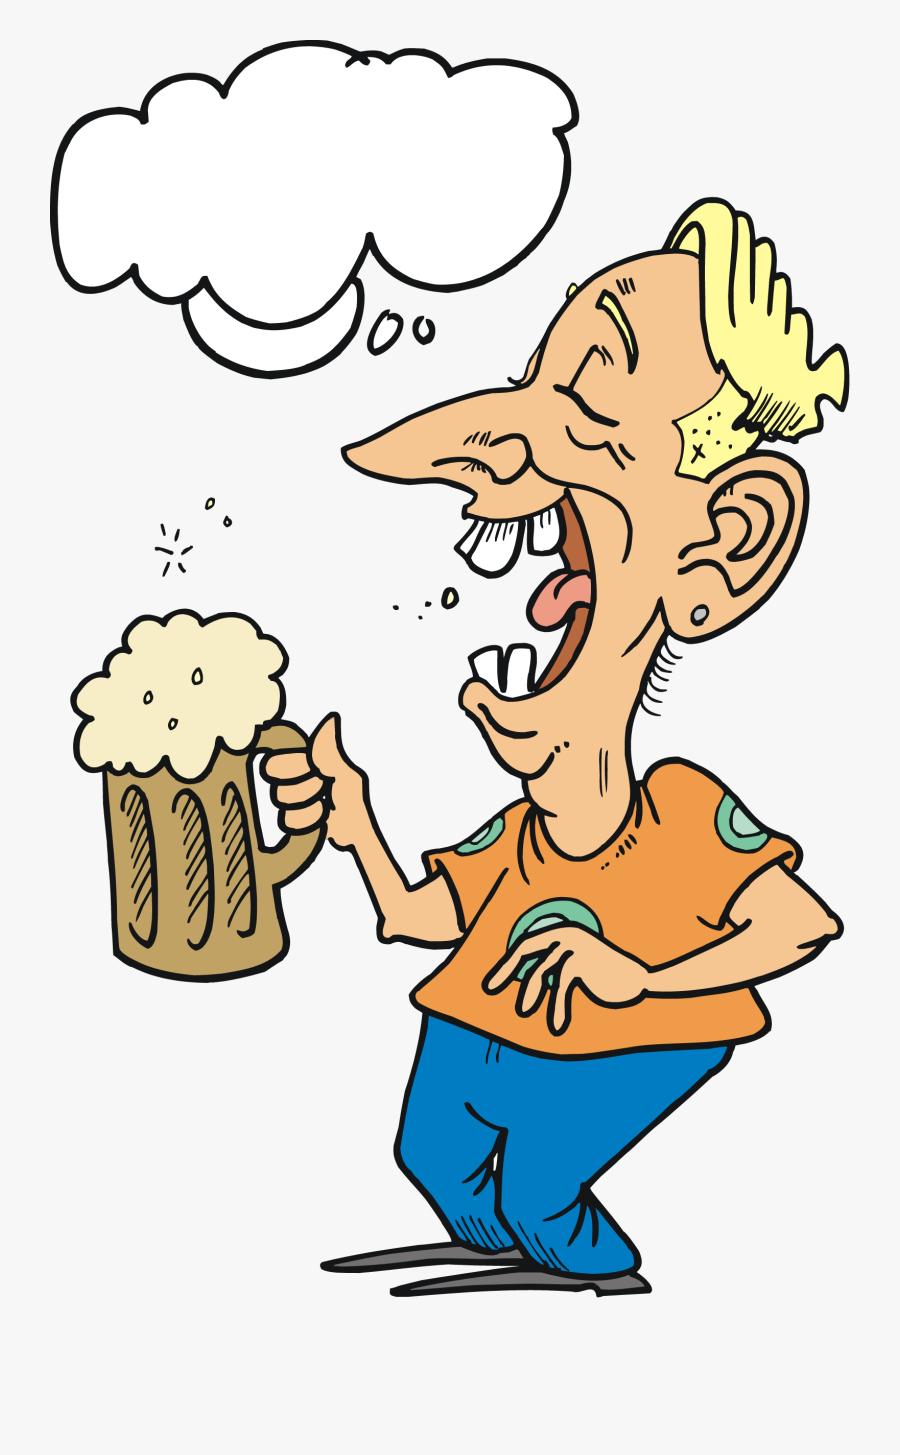 Clip Art Drunk Man Clipart - Funny Invitation Birthday Party, Transparent Clipart